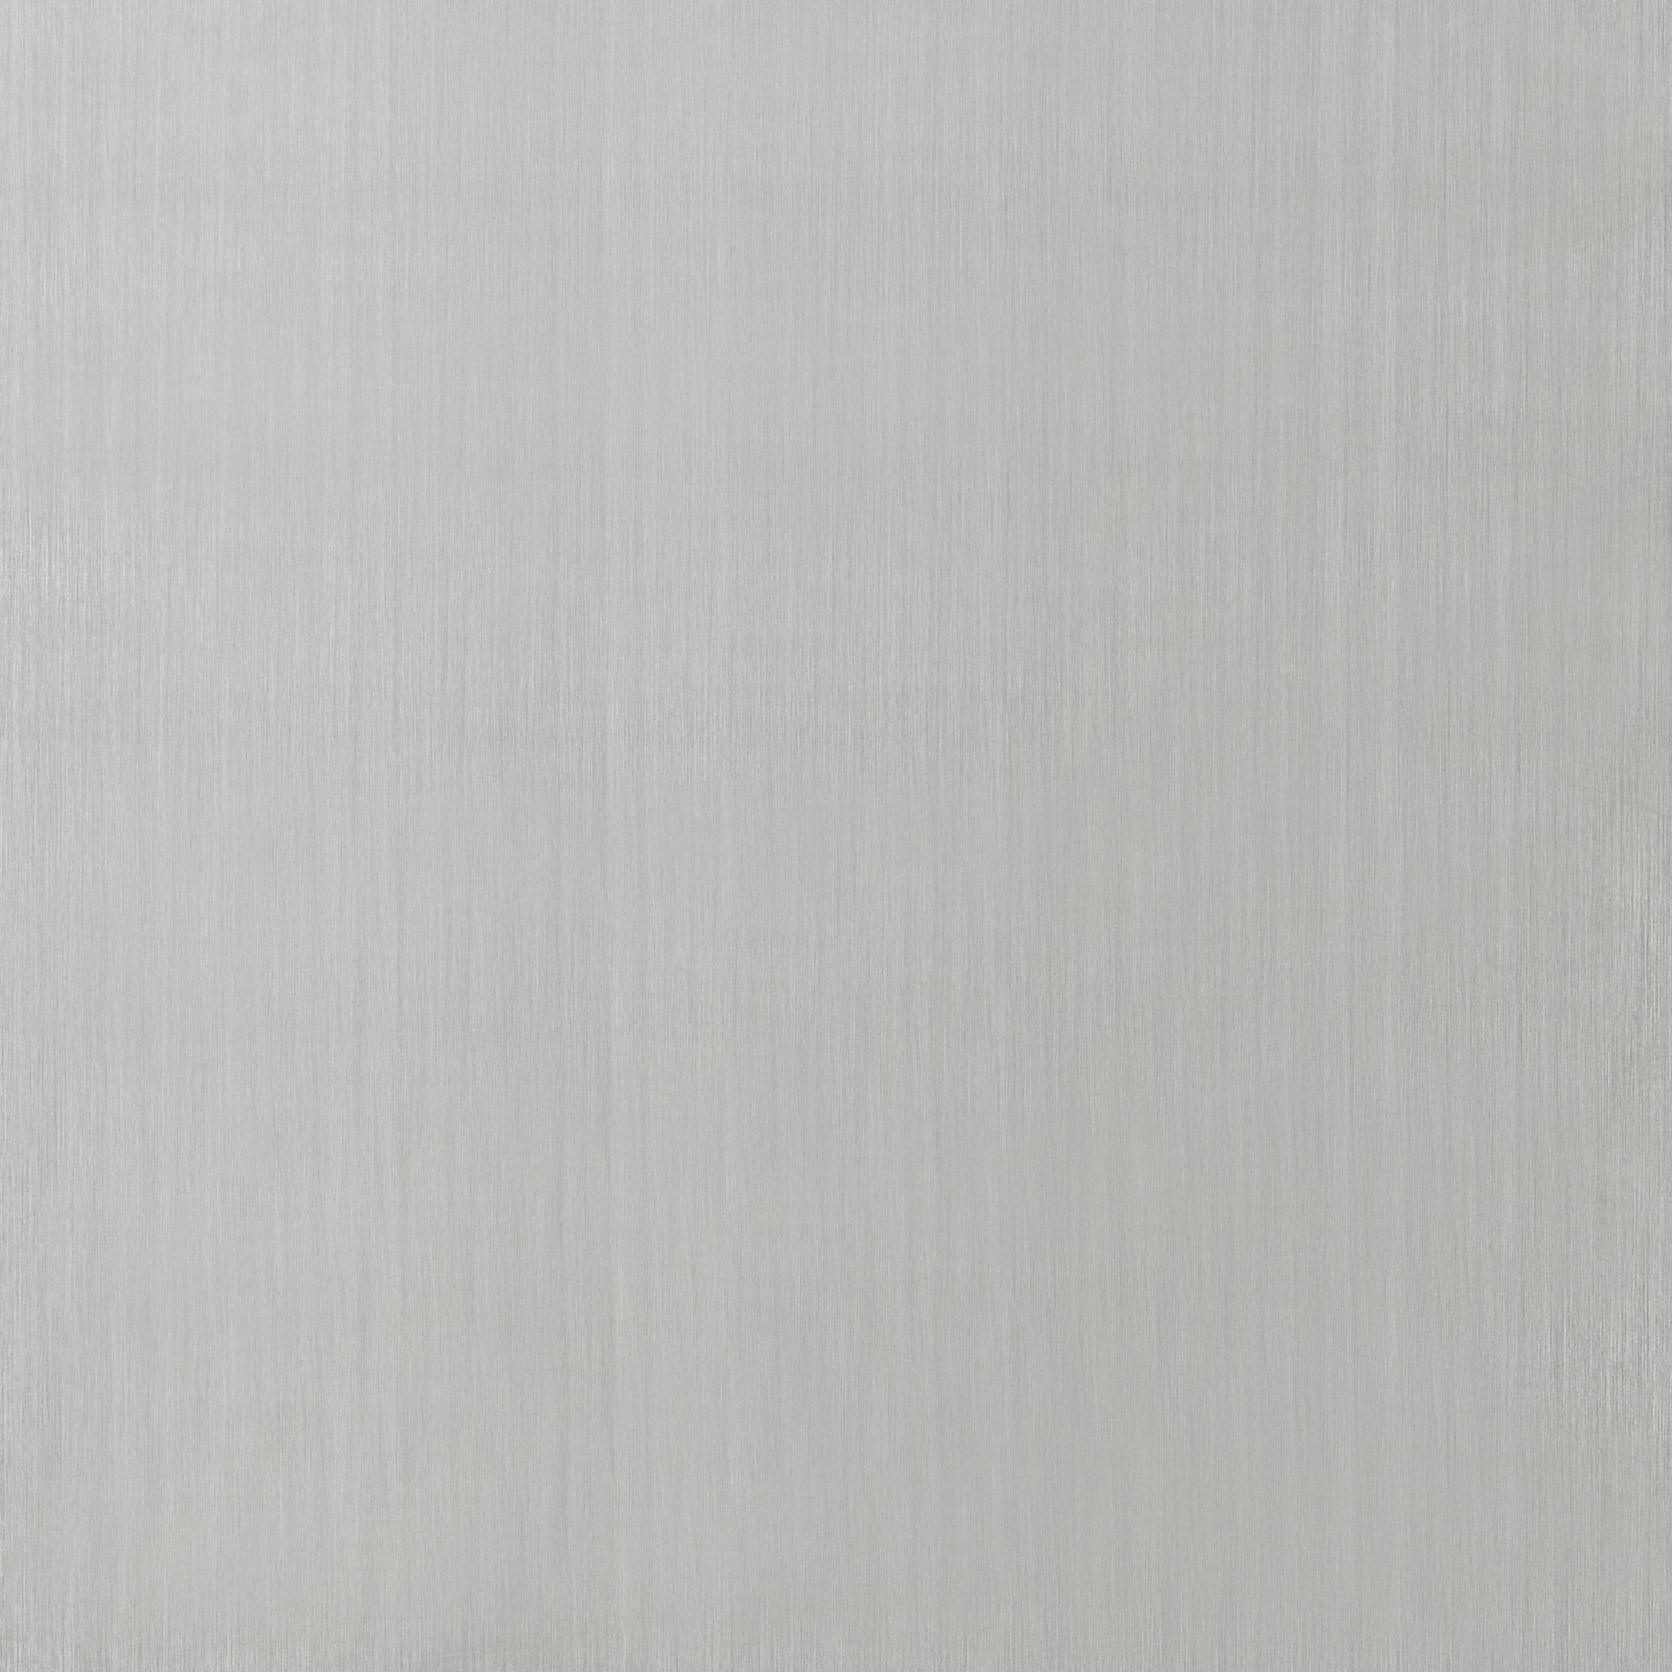 Poliform_kitchen_finiture_acciaio_STEELMATT